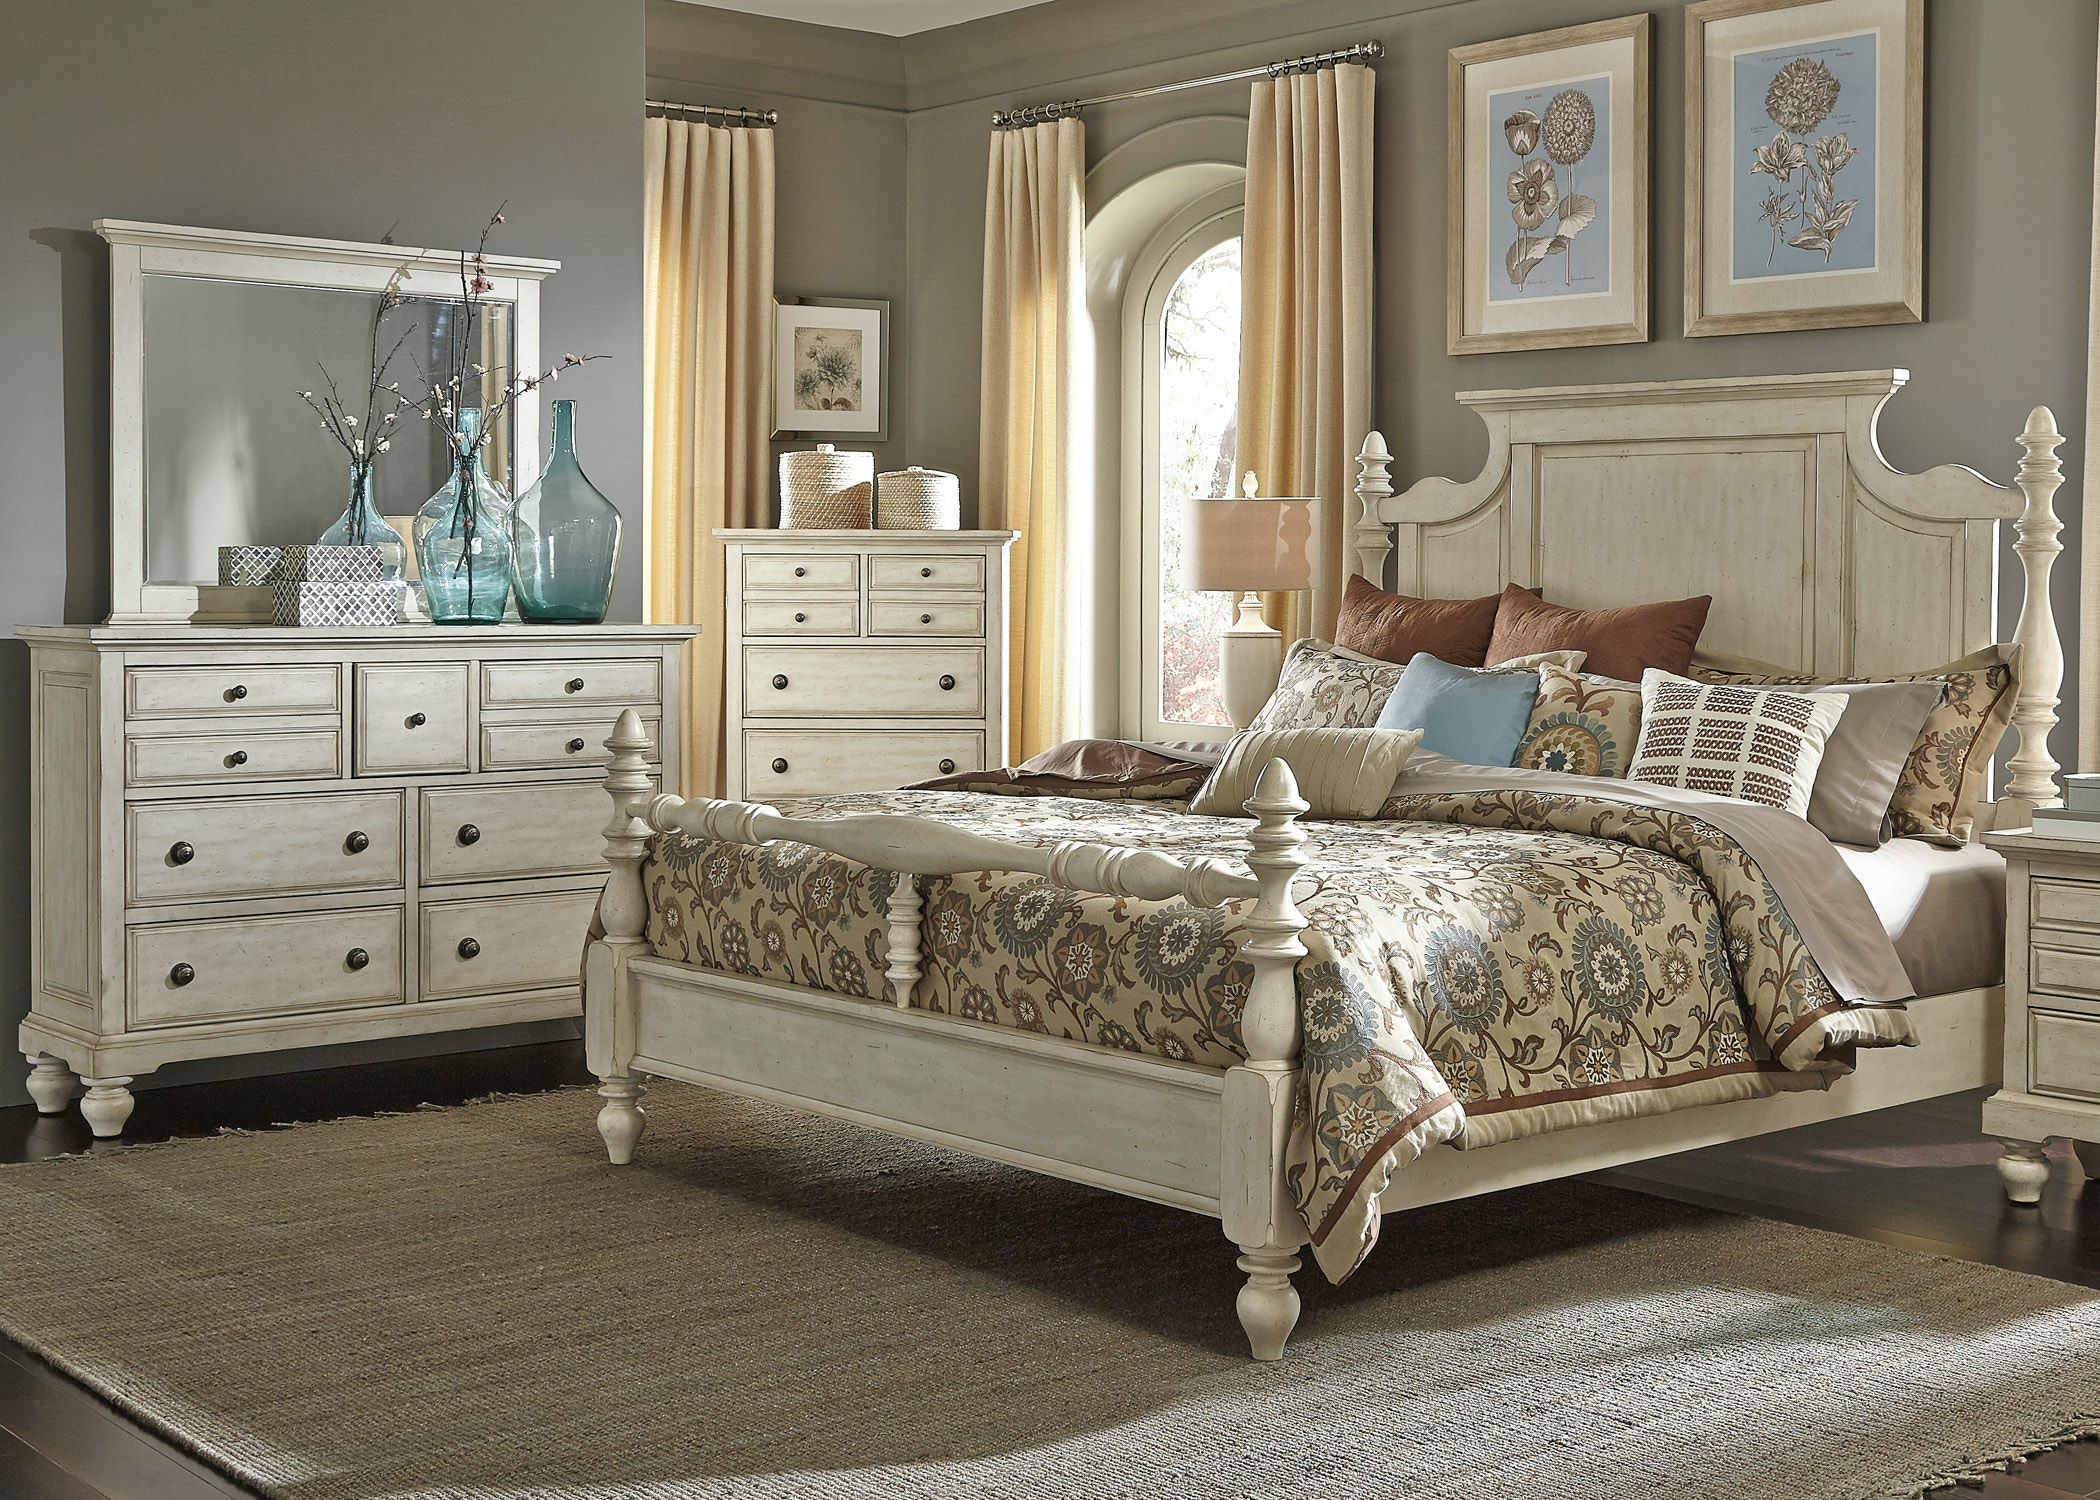 Liberty Furniture Bedroom Poster Bed Rails 697 BR90 At Waltman Furniture